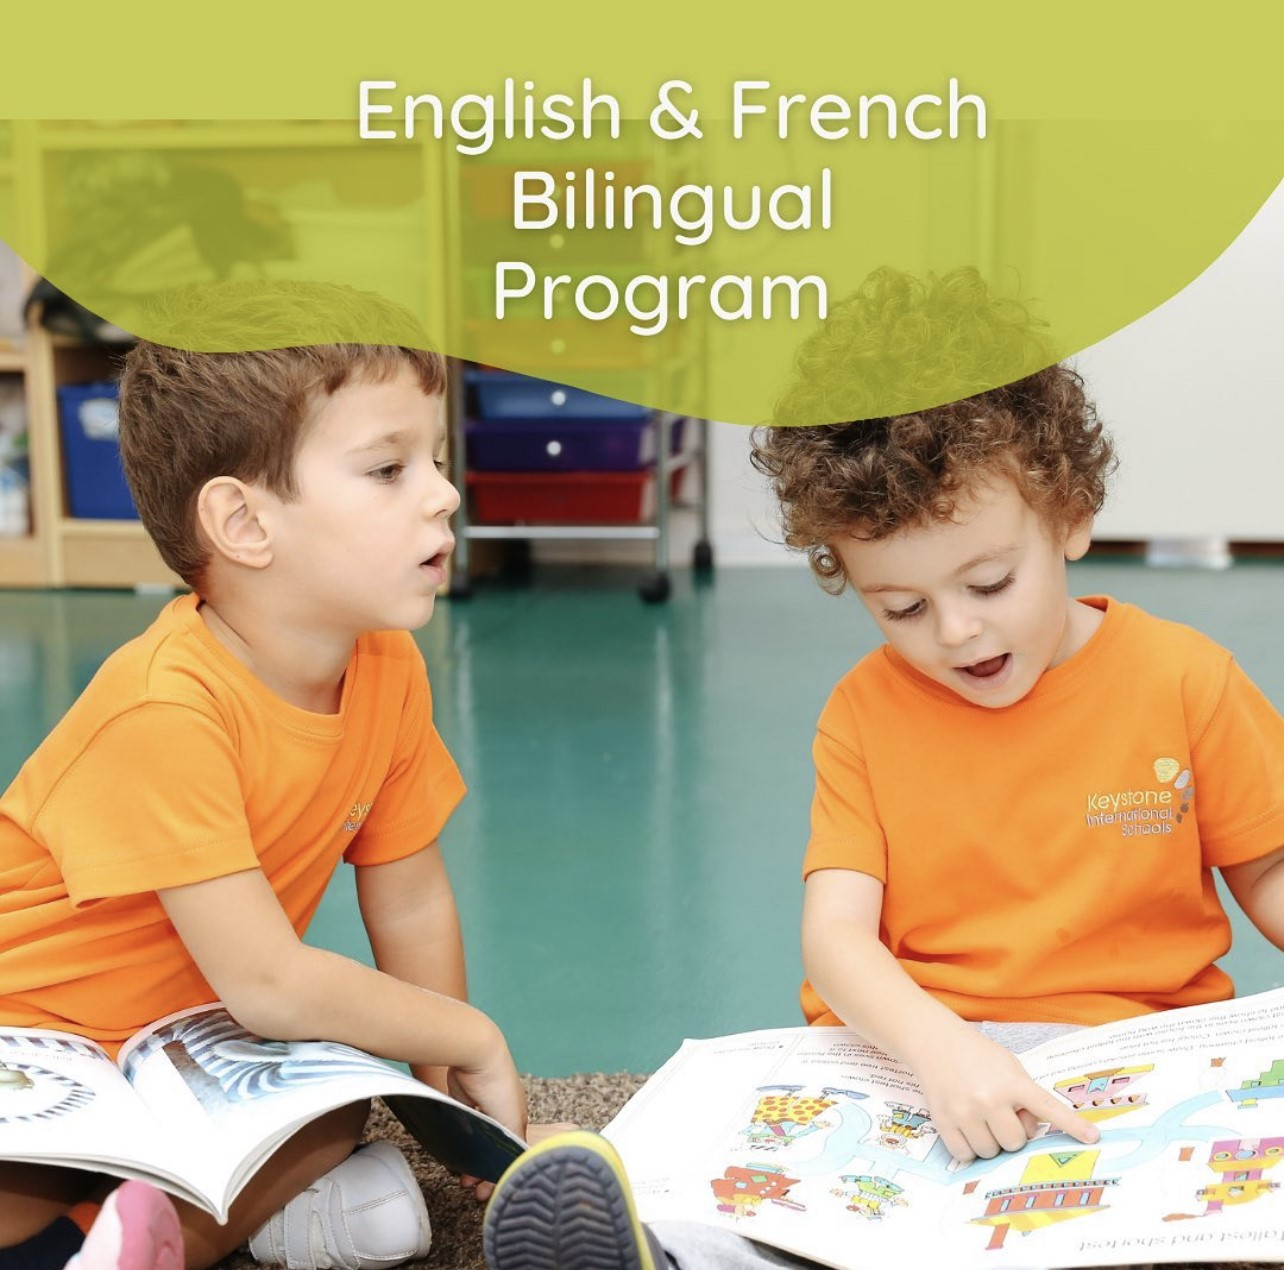 English and French Bilingual Program